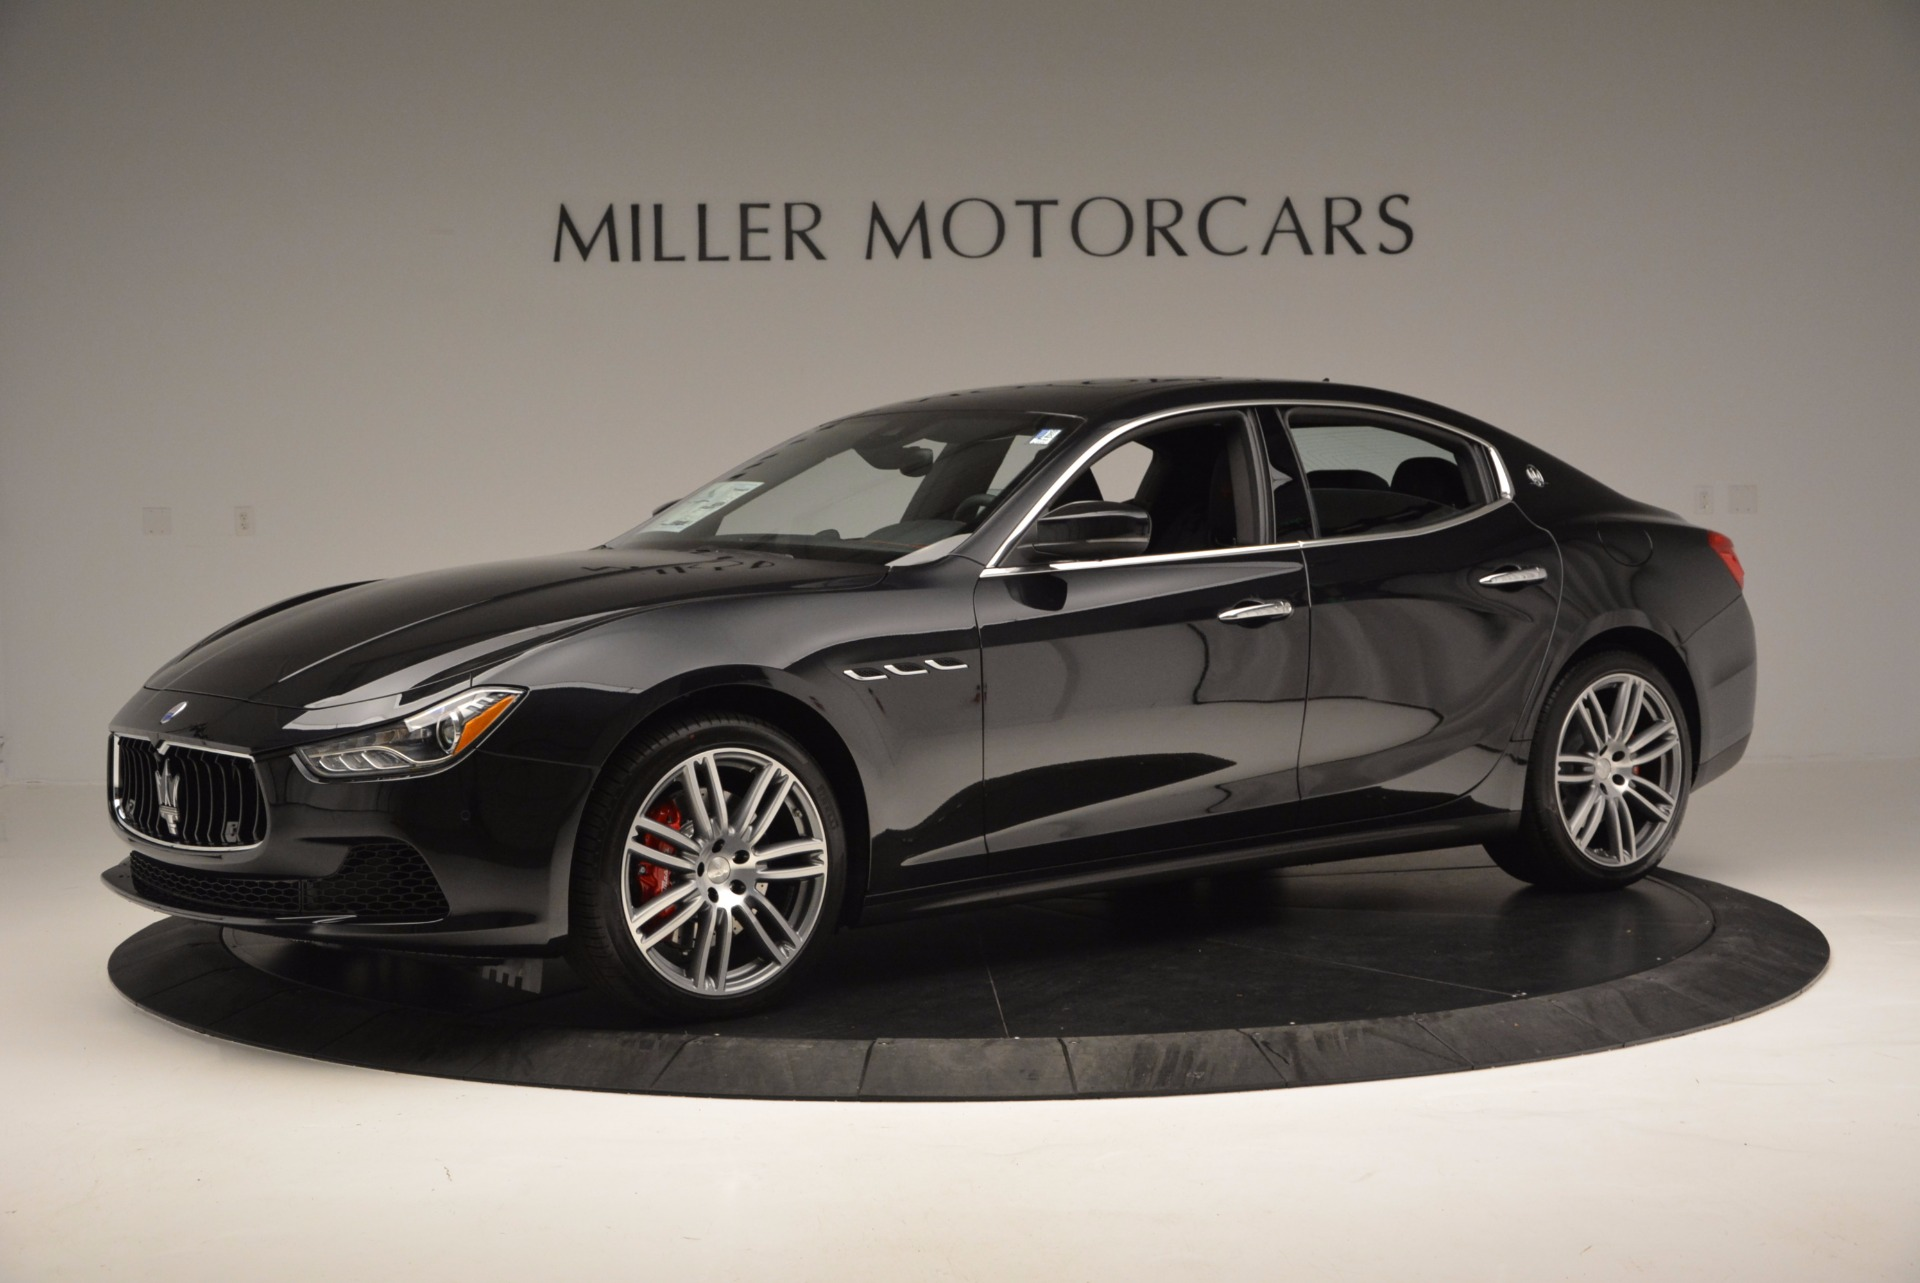 New 2017 Maserati Ghibli S Q4 For Sale In Westport, CT 1114_p2